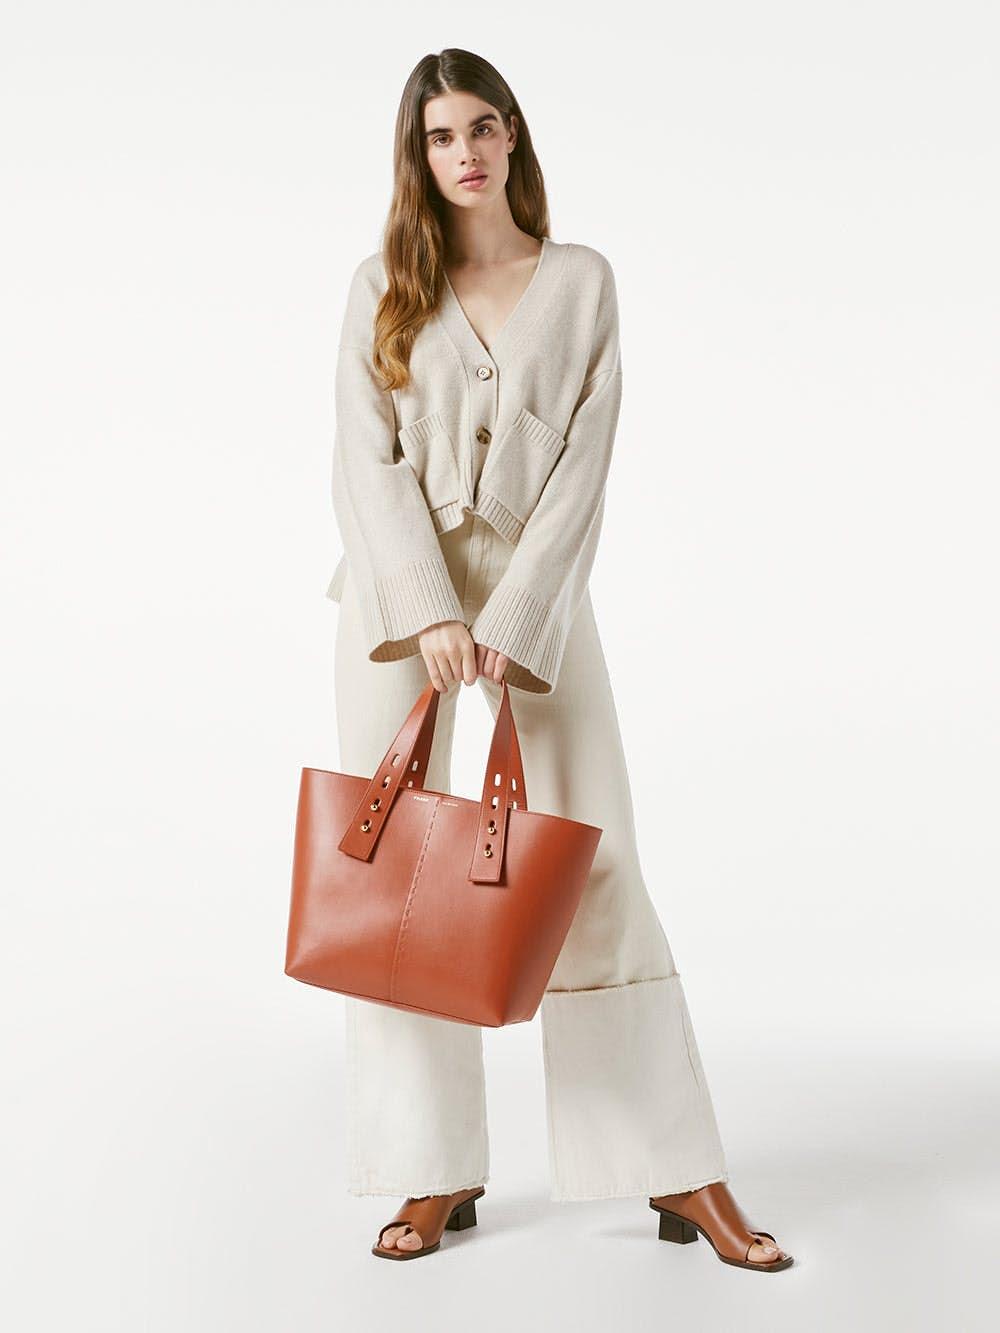 handbag front full body view